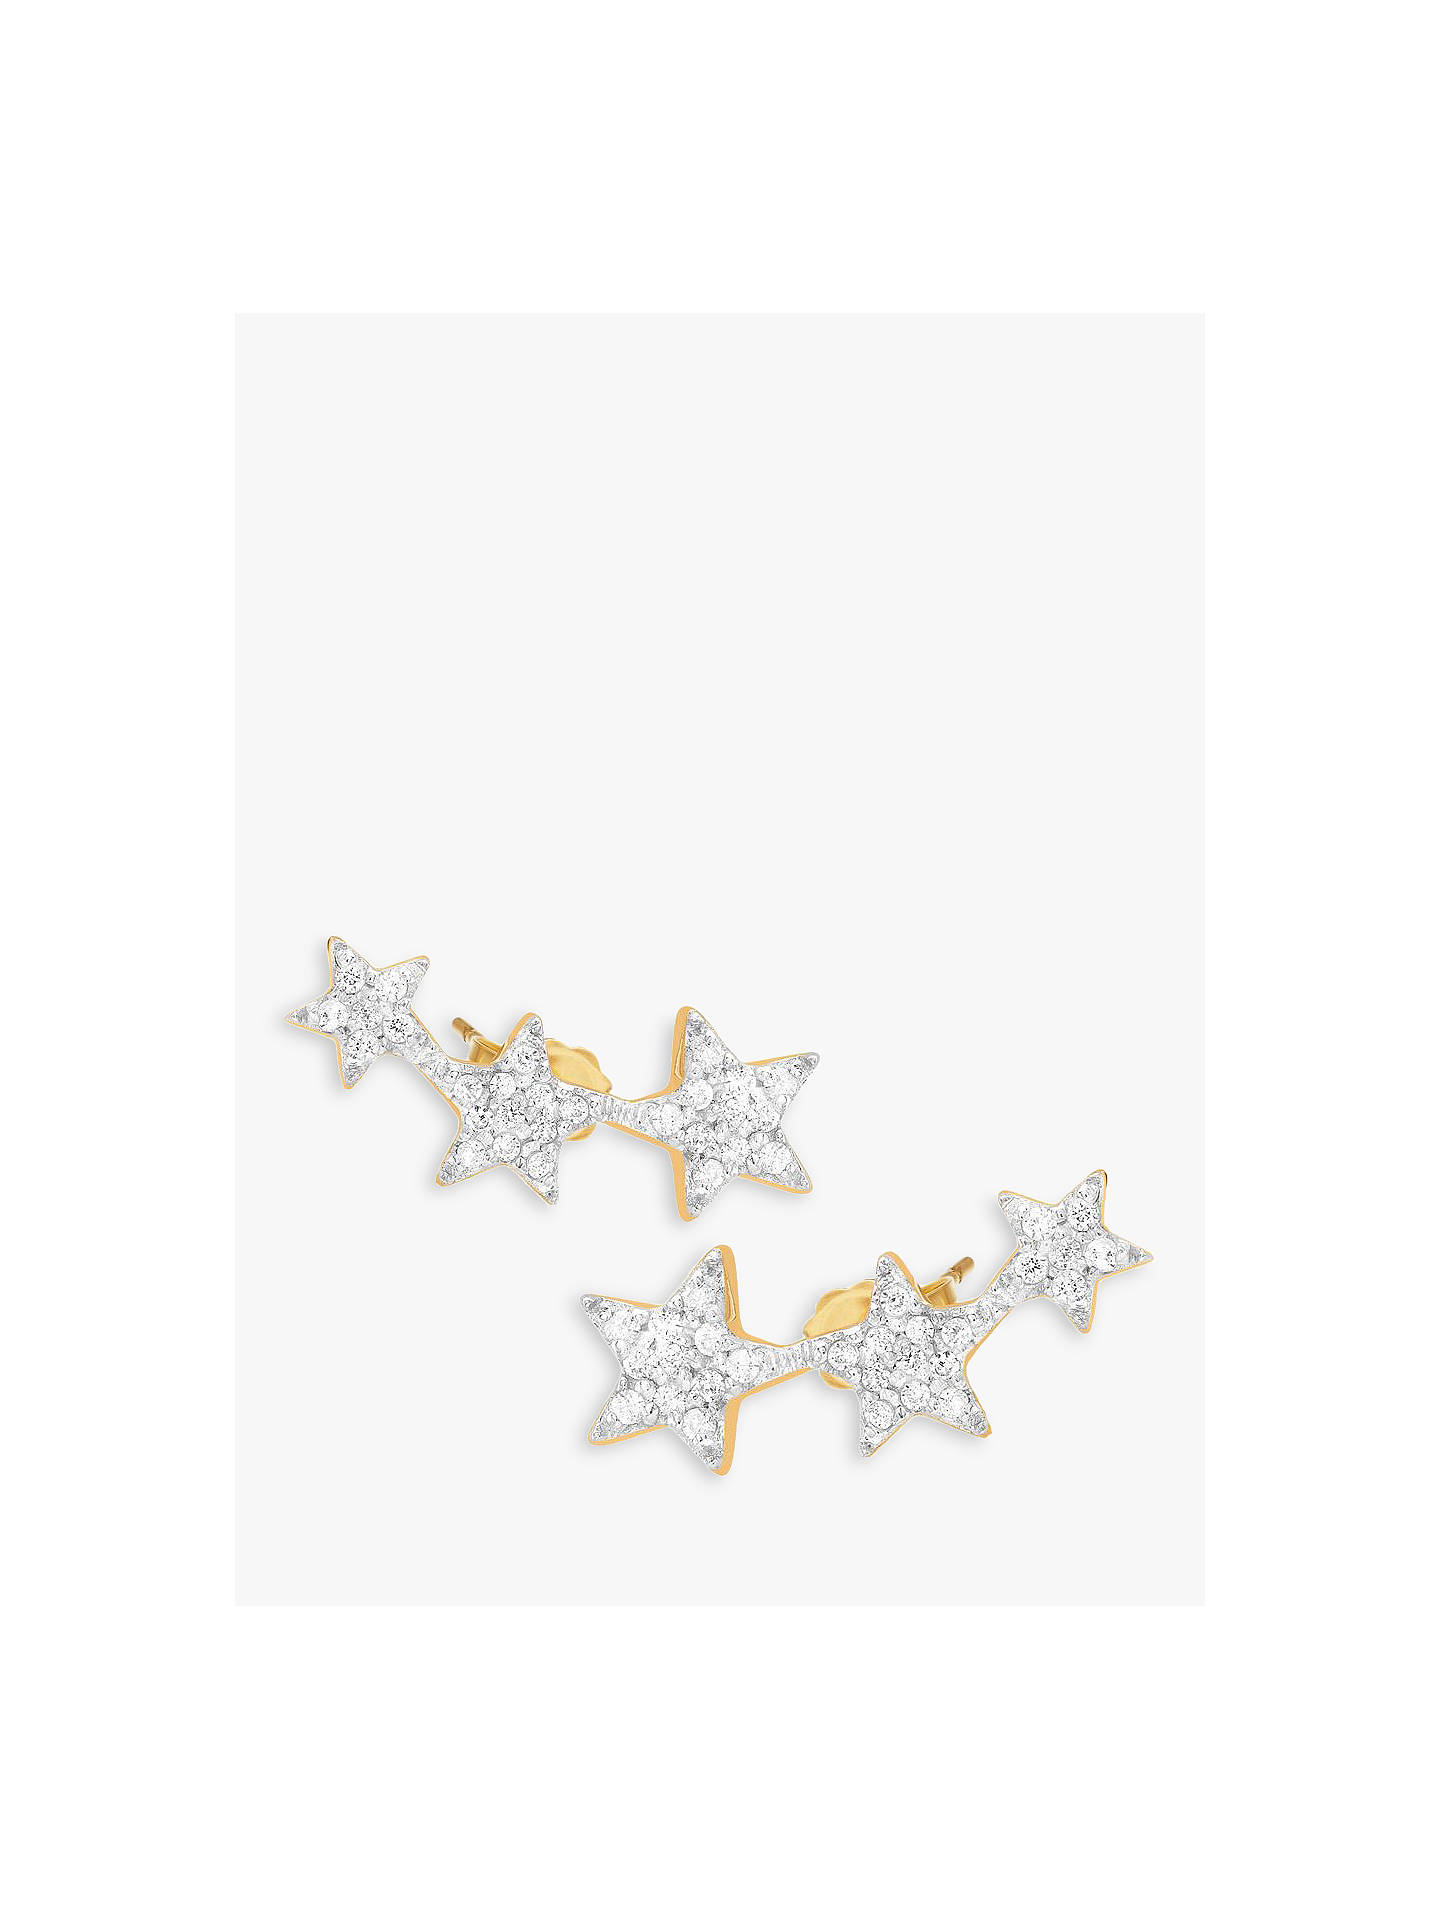 Missoma 18ct Gold Vermeil Pave Star Cosmic Stud Earrings Online At Johnlewis